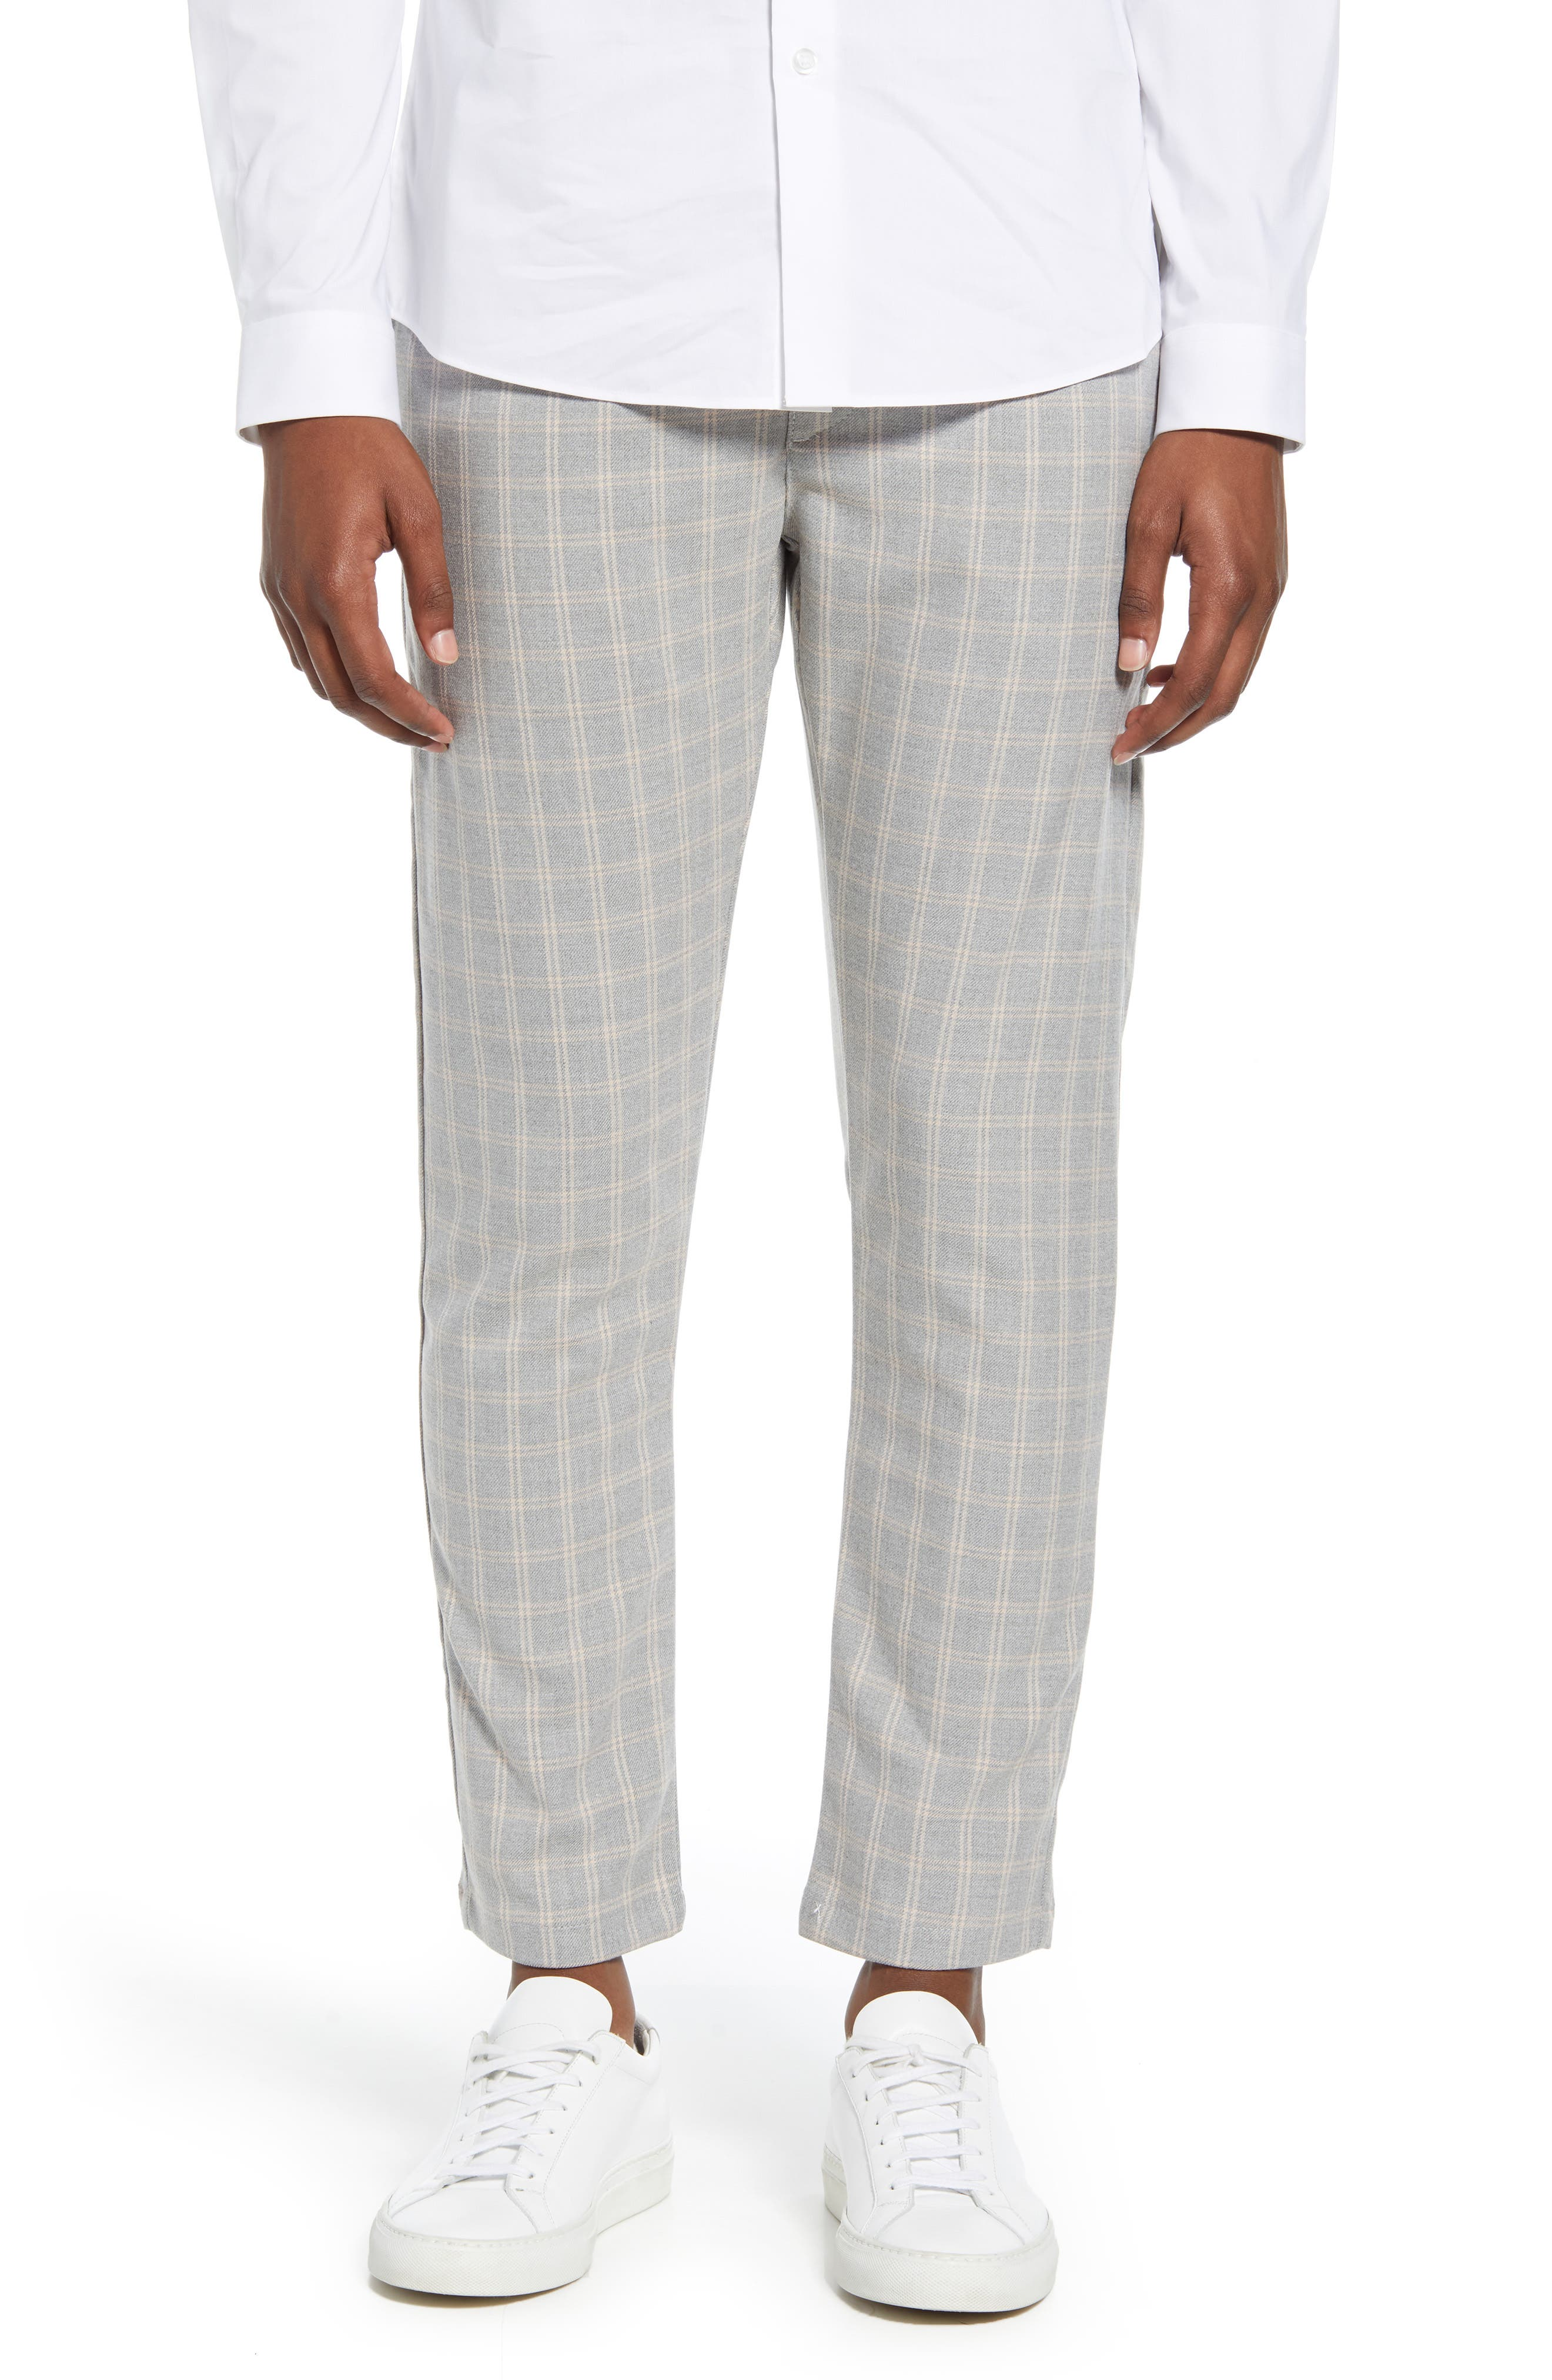 60s – 70s Mens Bell Bottom Jeans, Flares, Disco Pants Mens Topman Whyatt Check Slim Fit Trousers $65.00 AT vintagedancer.com